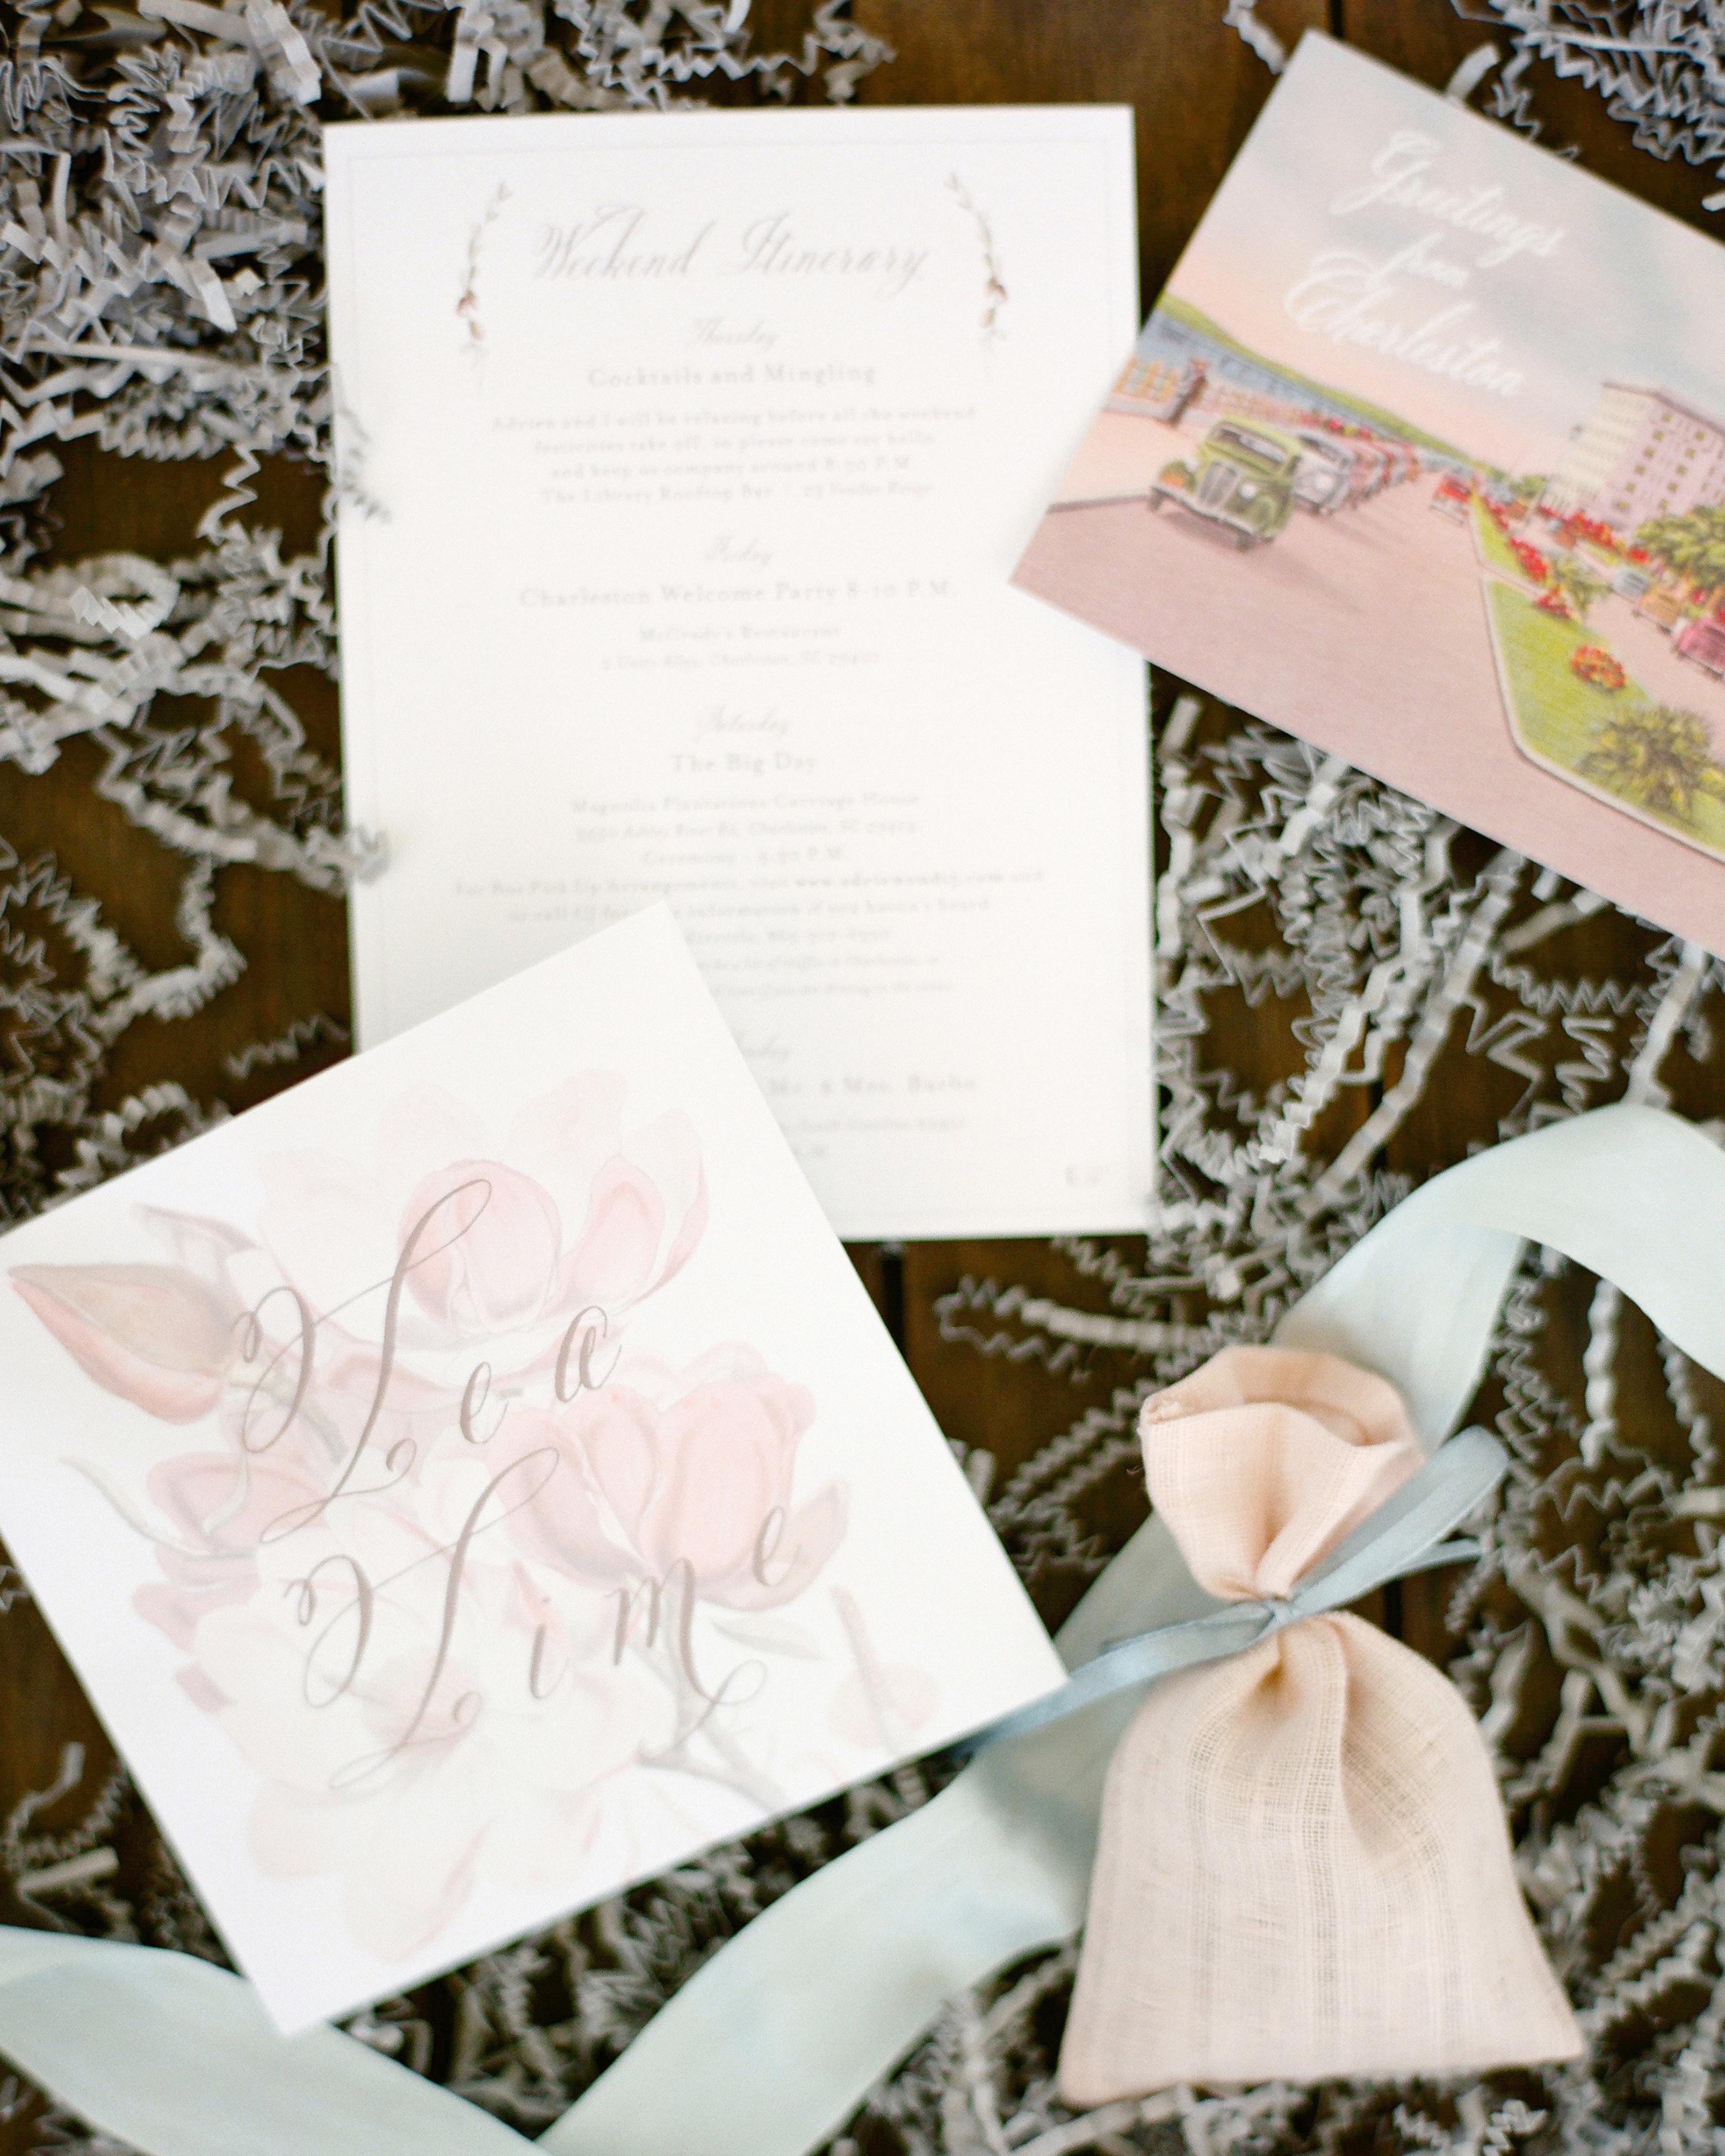 catherine-adrien-wedding-tea-0214-s111414-0814.jpg